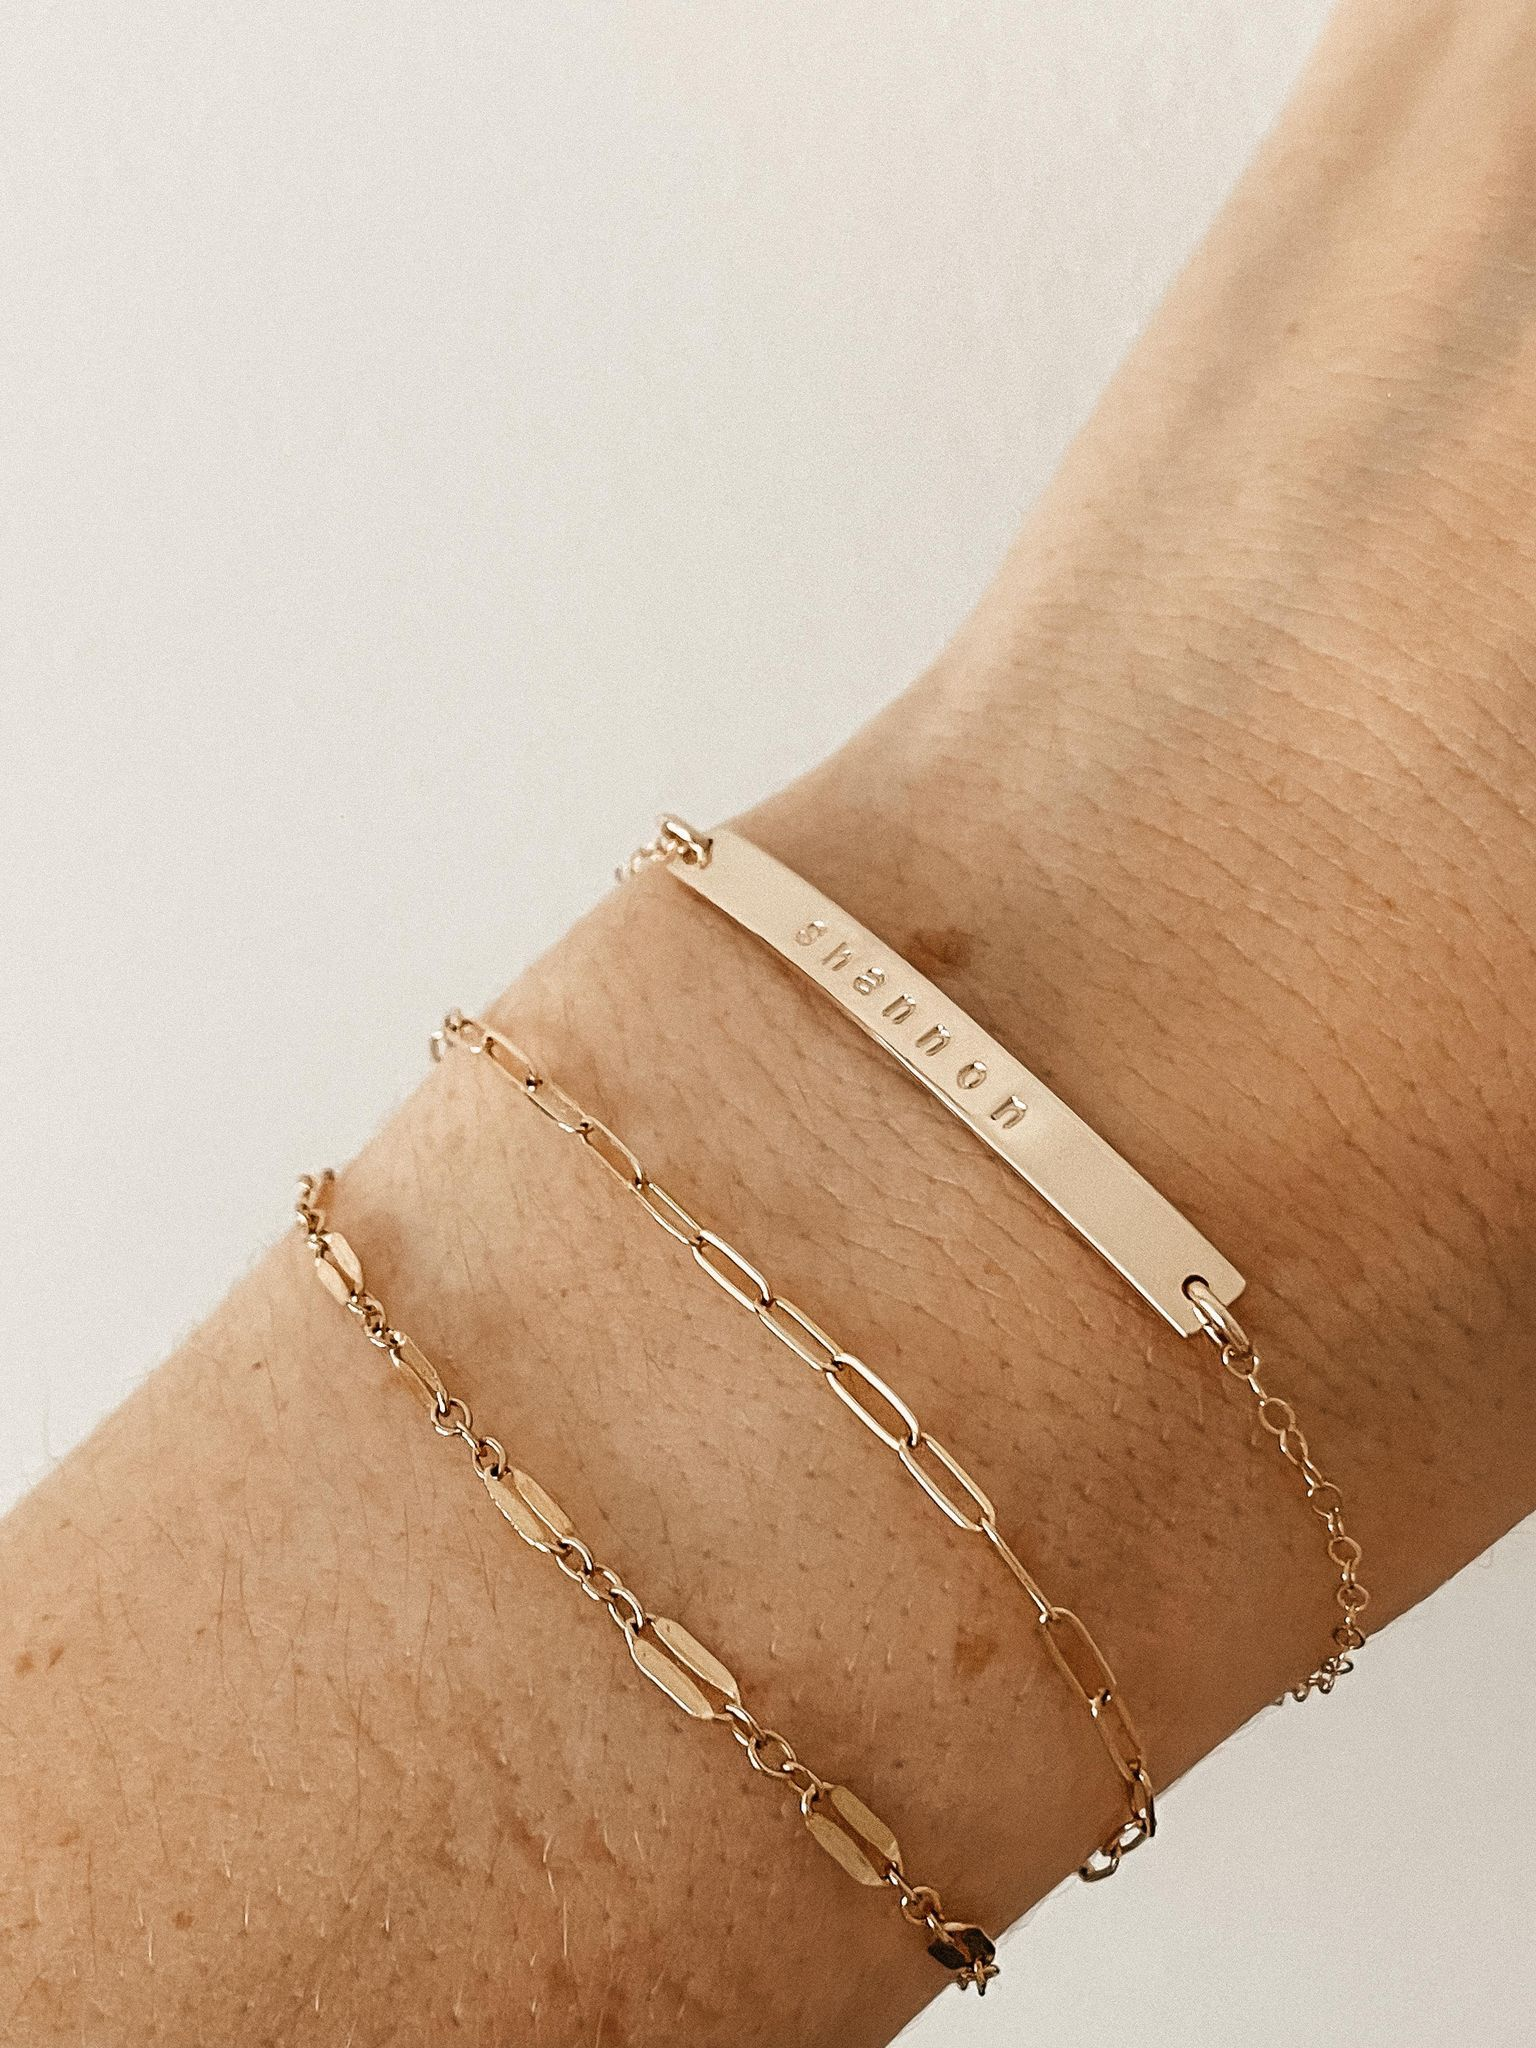 Paisley Custom Bar Bracelet - 9 / Sterling Silver / Cable